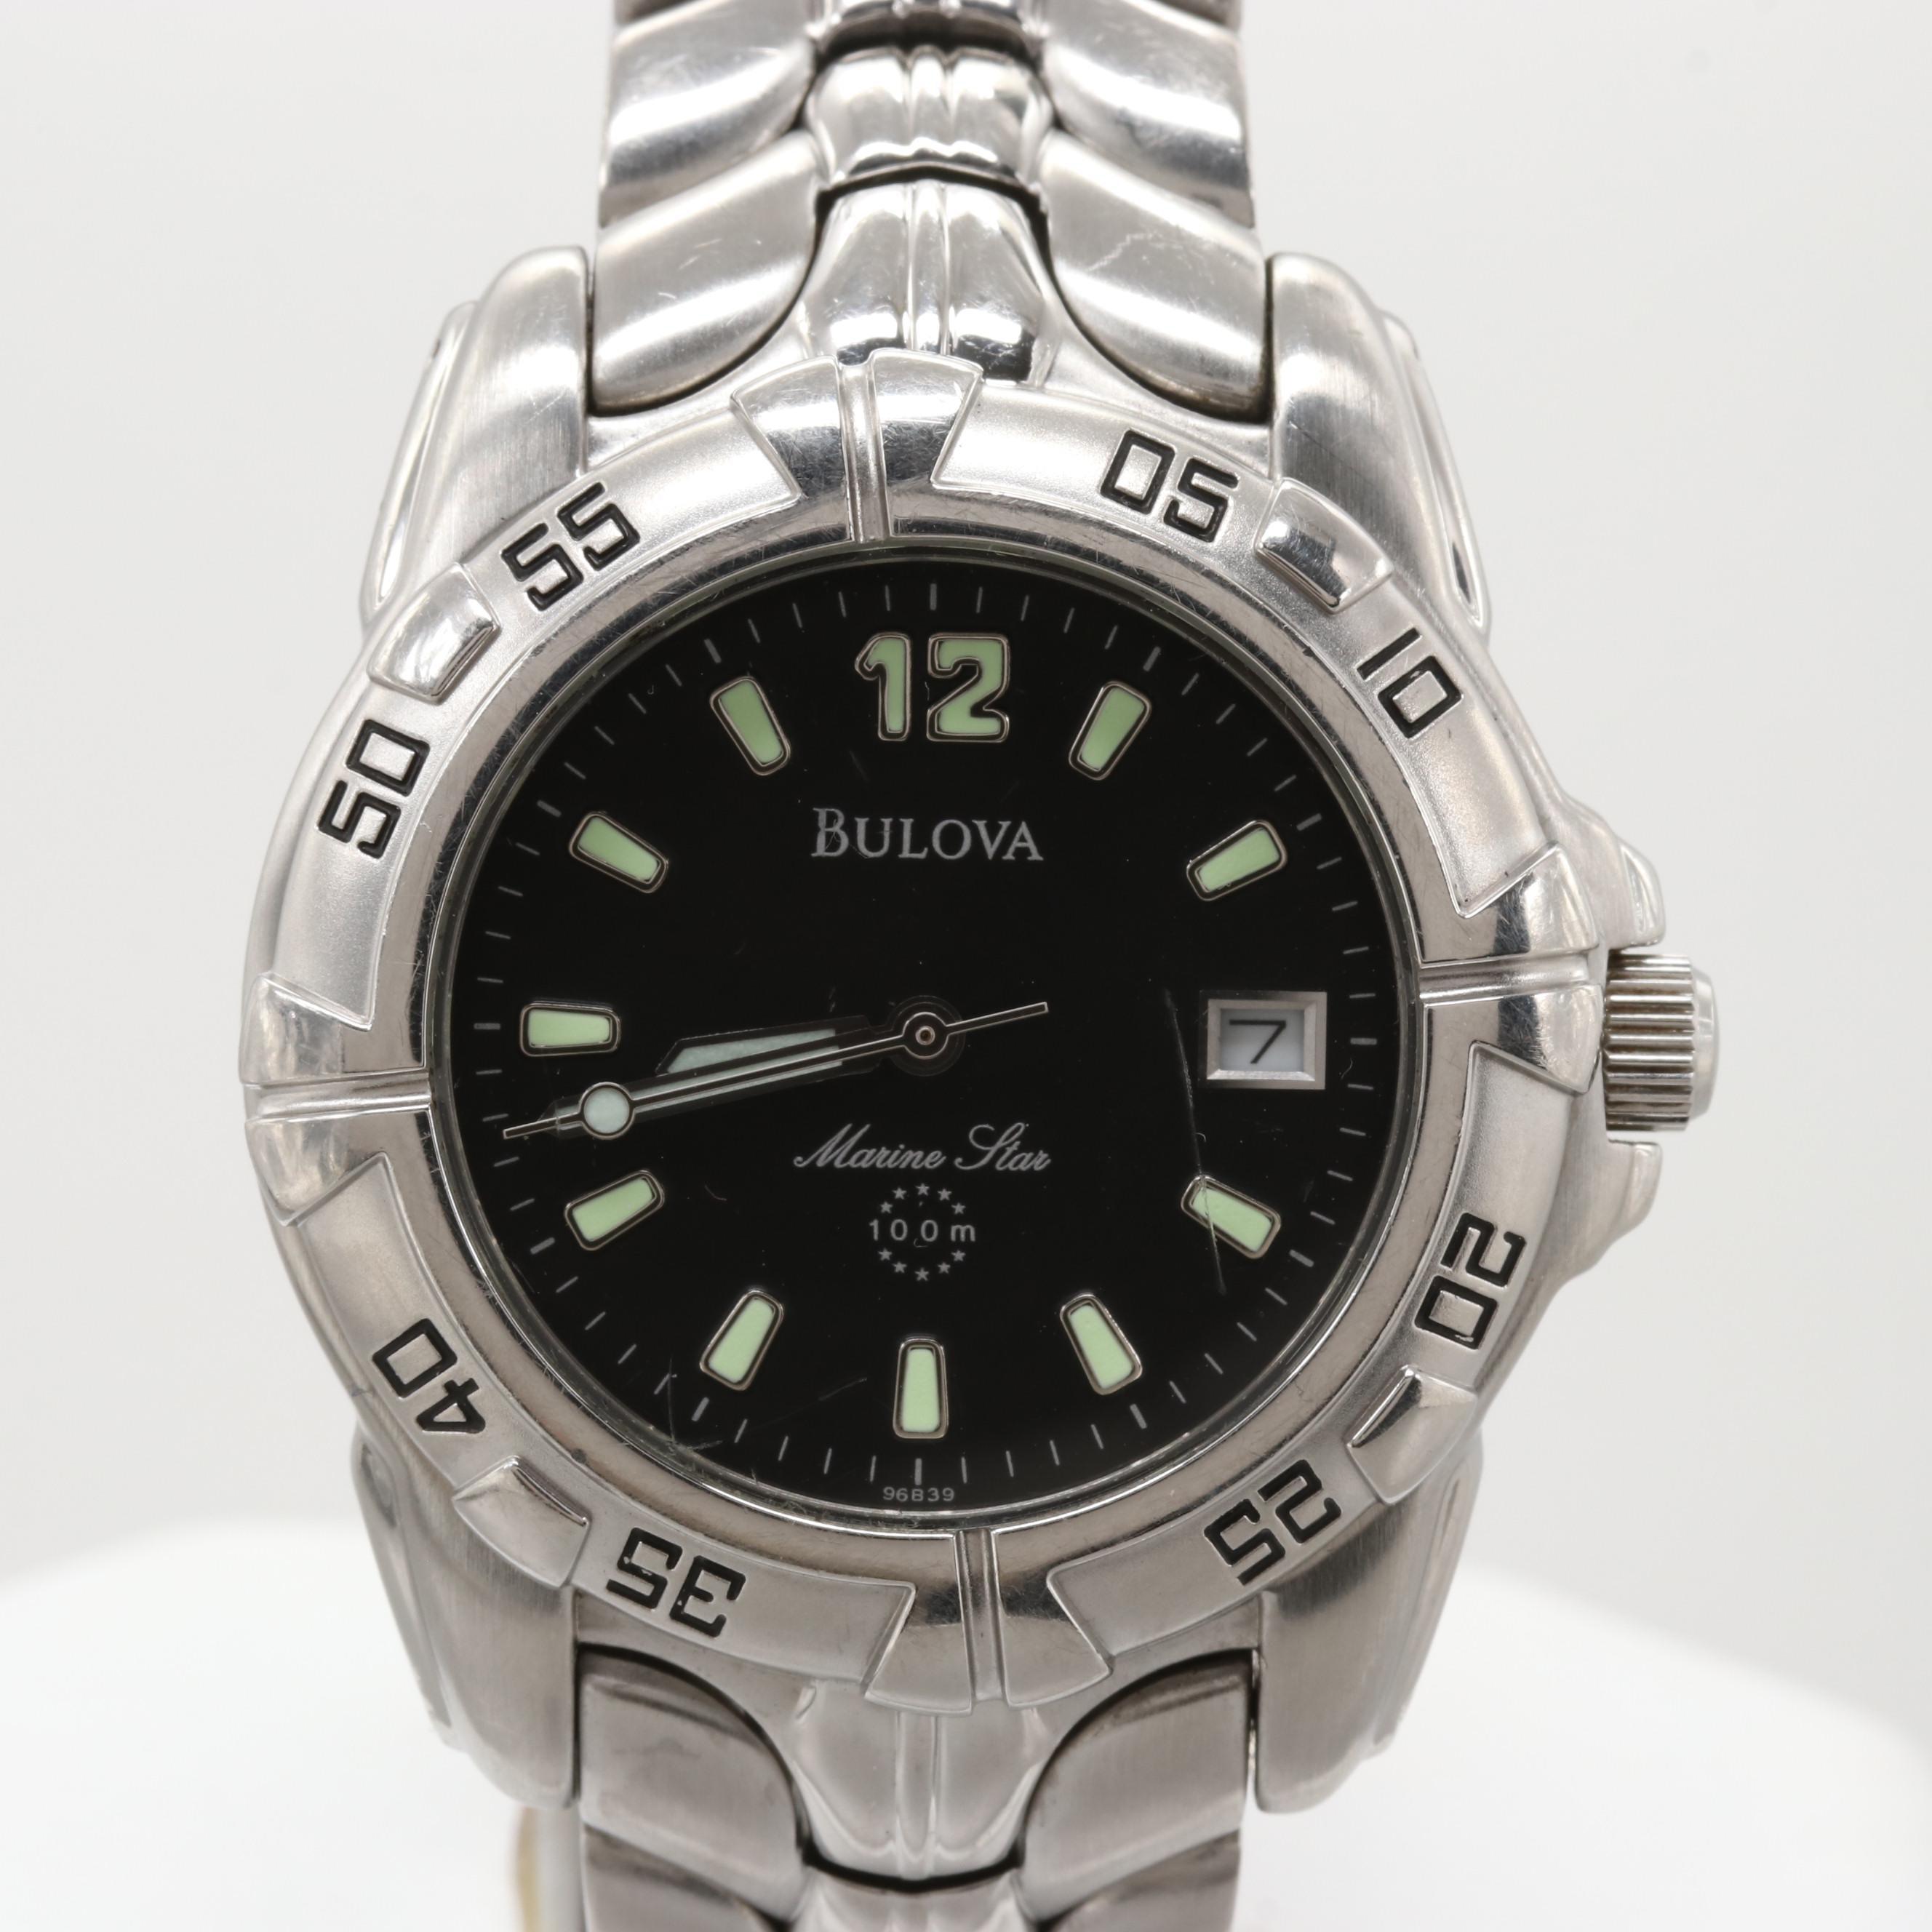 Bulova Marine Star Stainless Steel Quartz Wristwatch